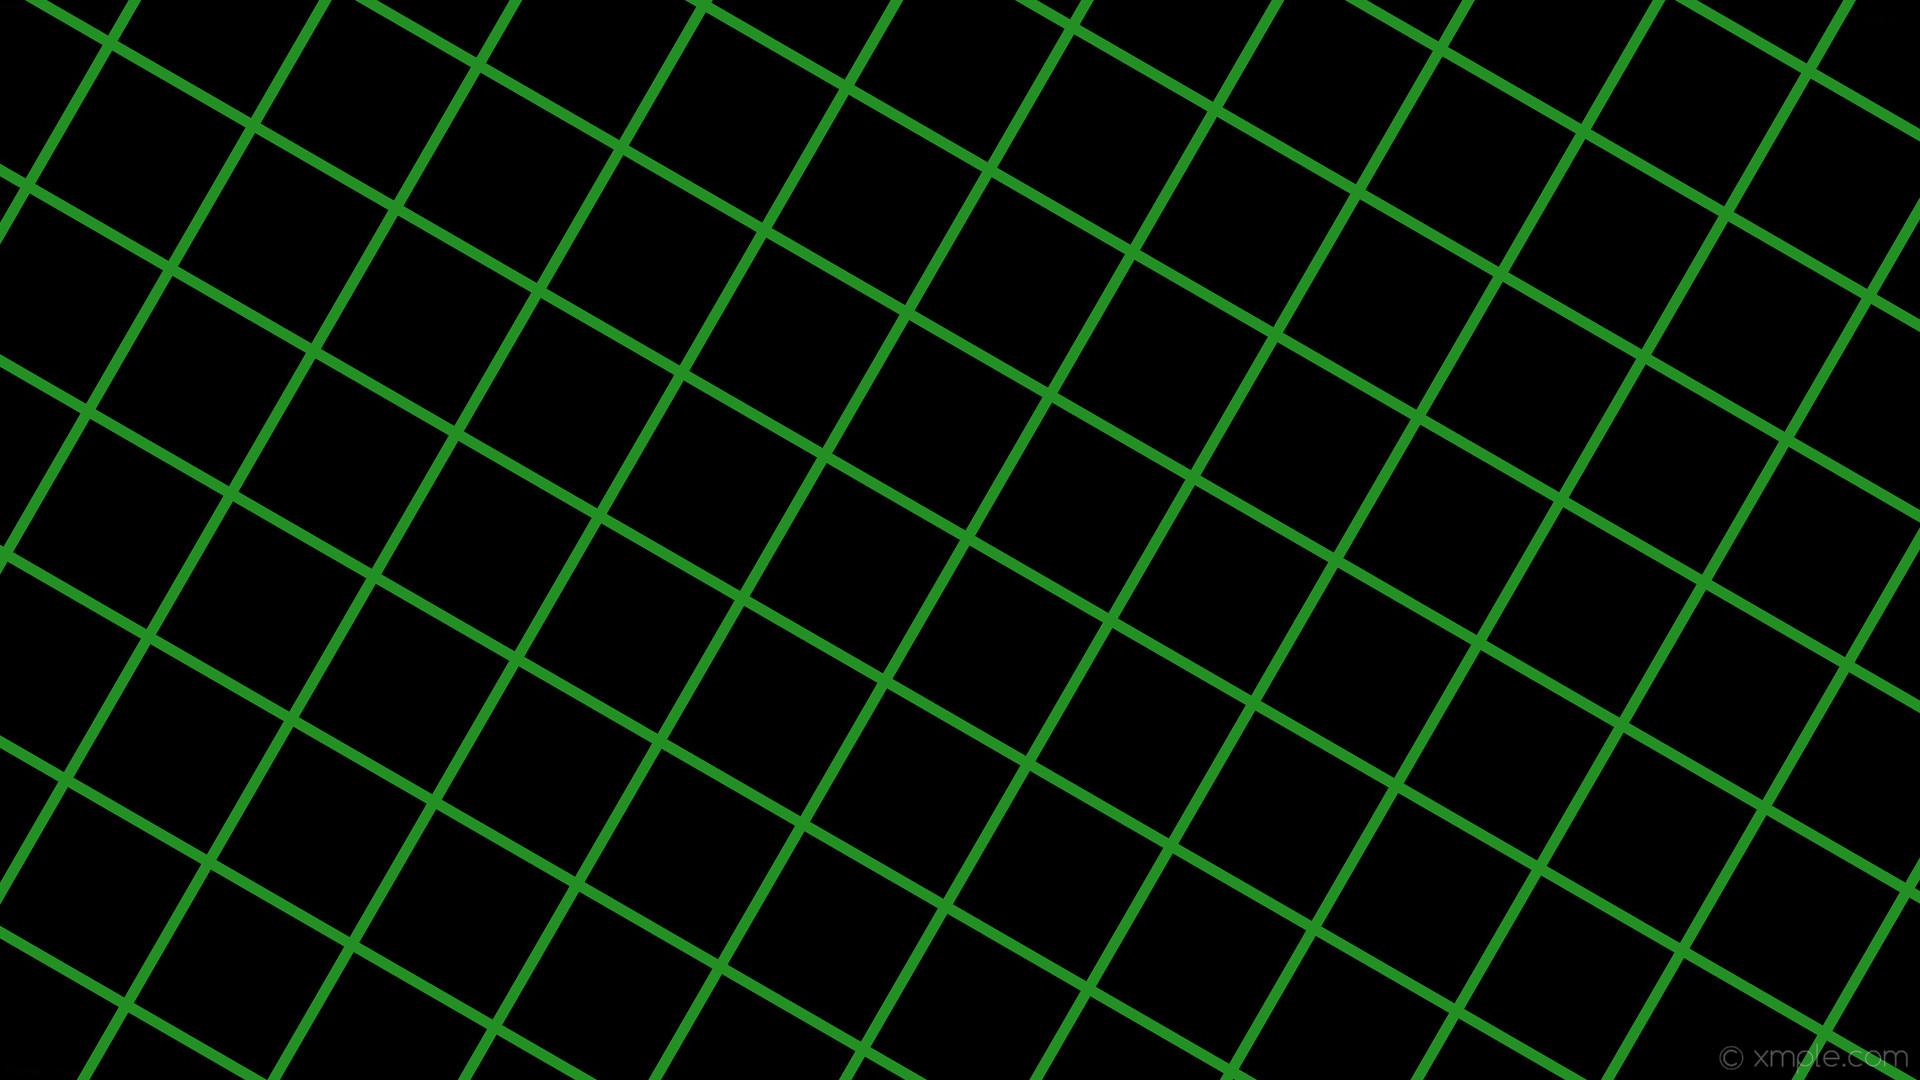 wallpaper graph paper black green grid lime green #000000 #32cd32 60° 11px  165px